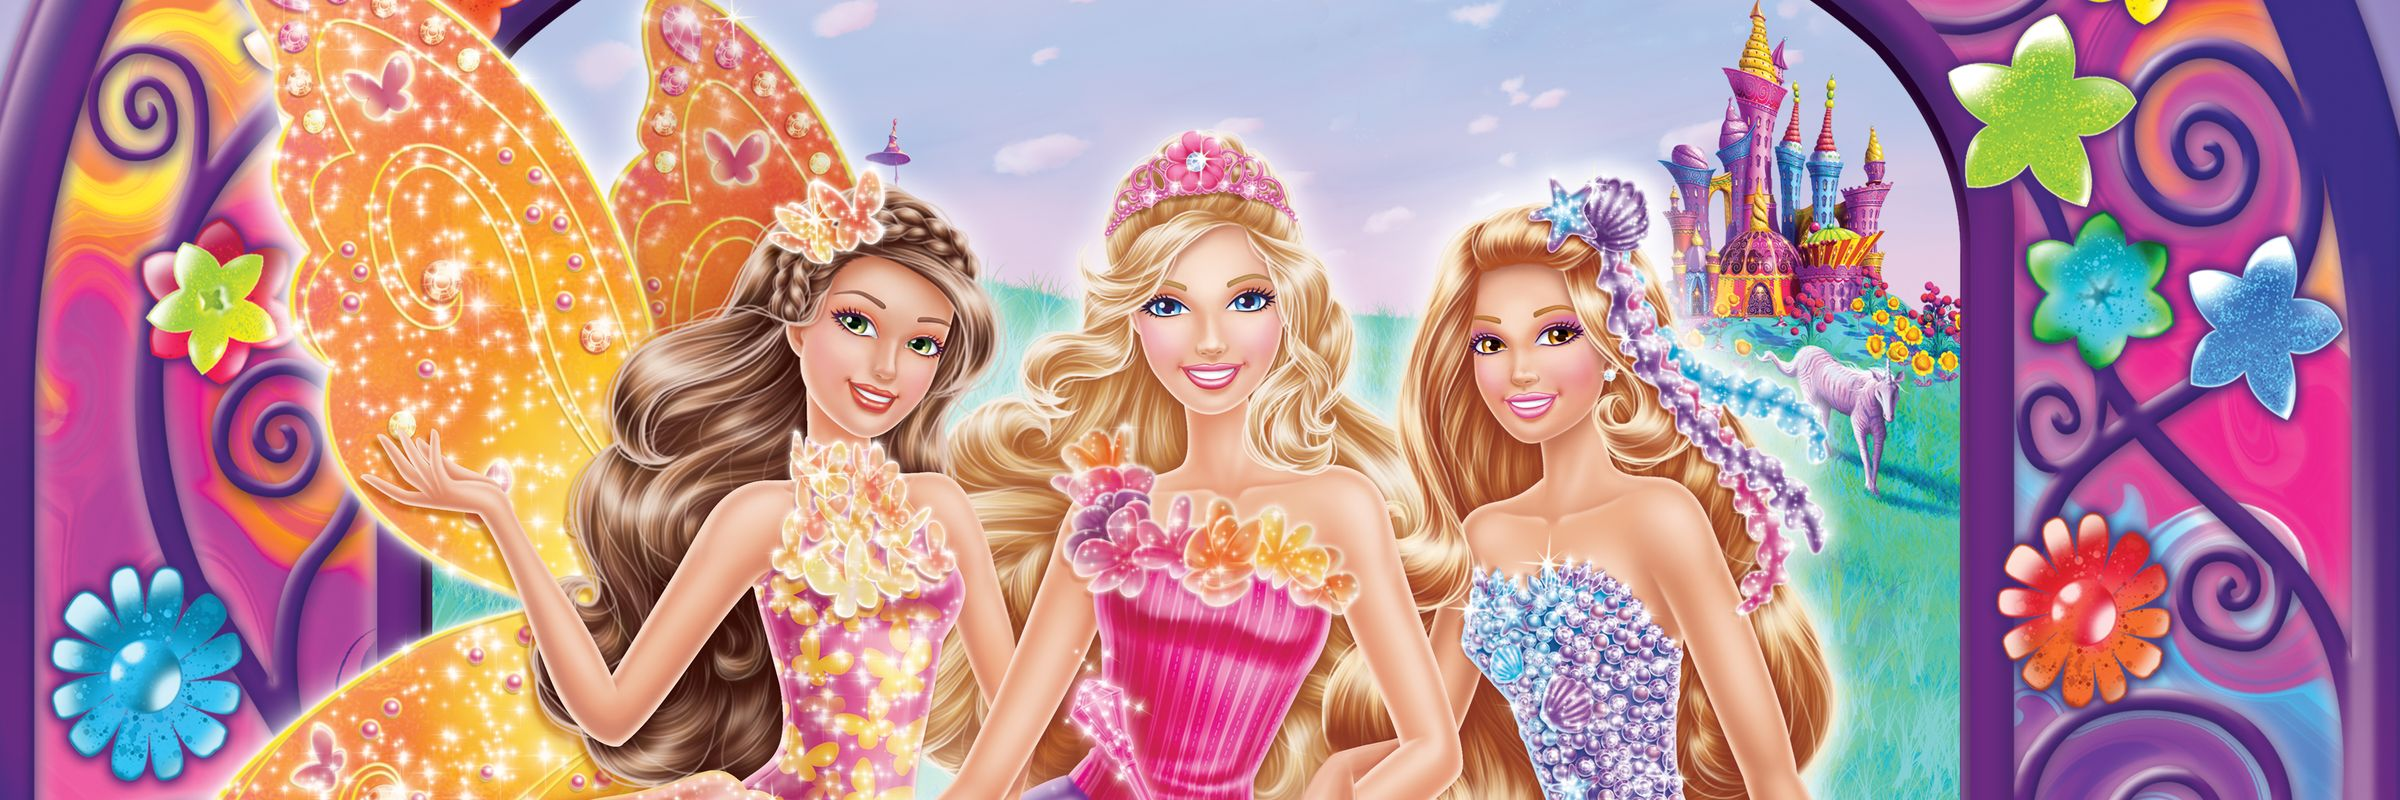 barbie and the secret door full movie in hindi download